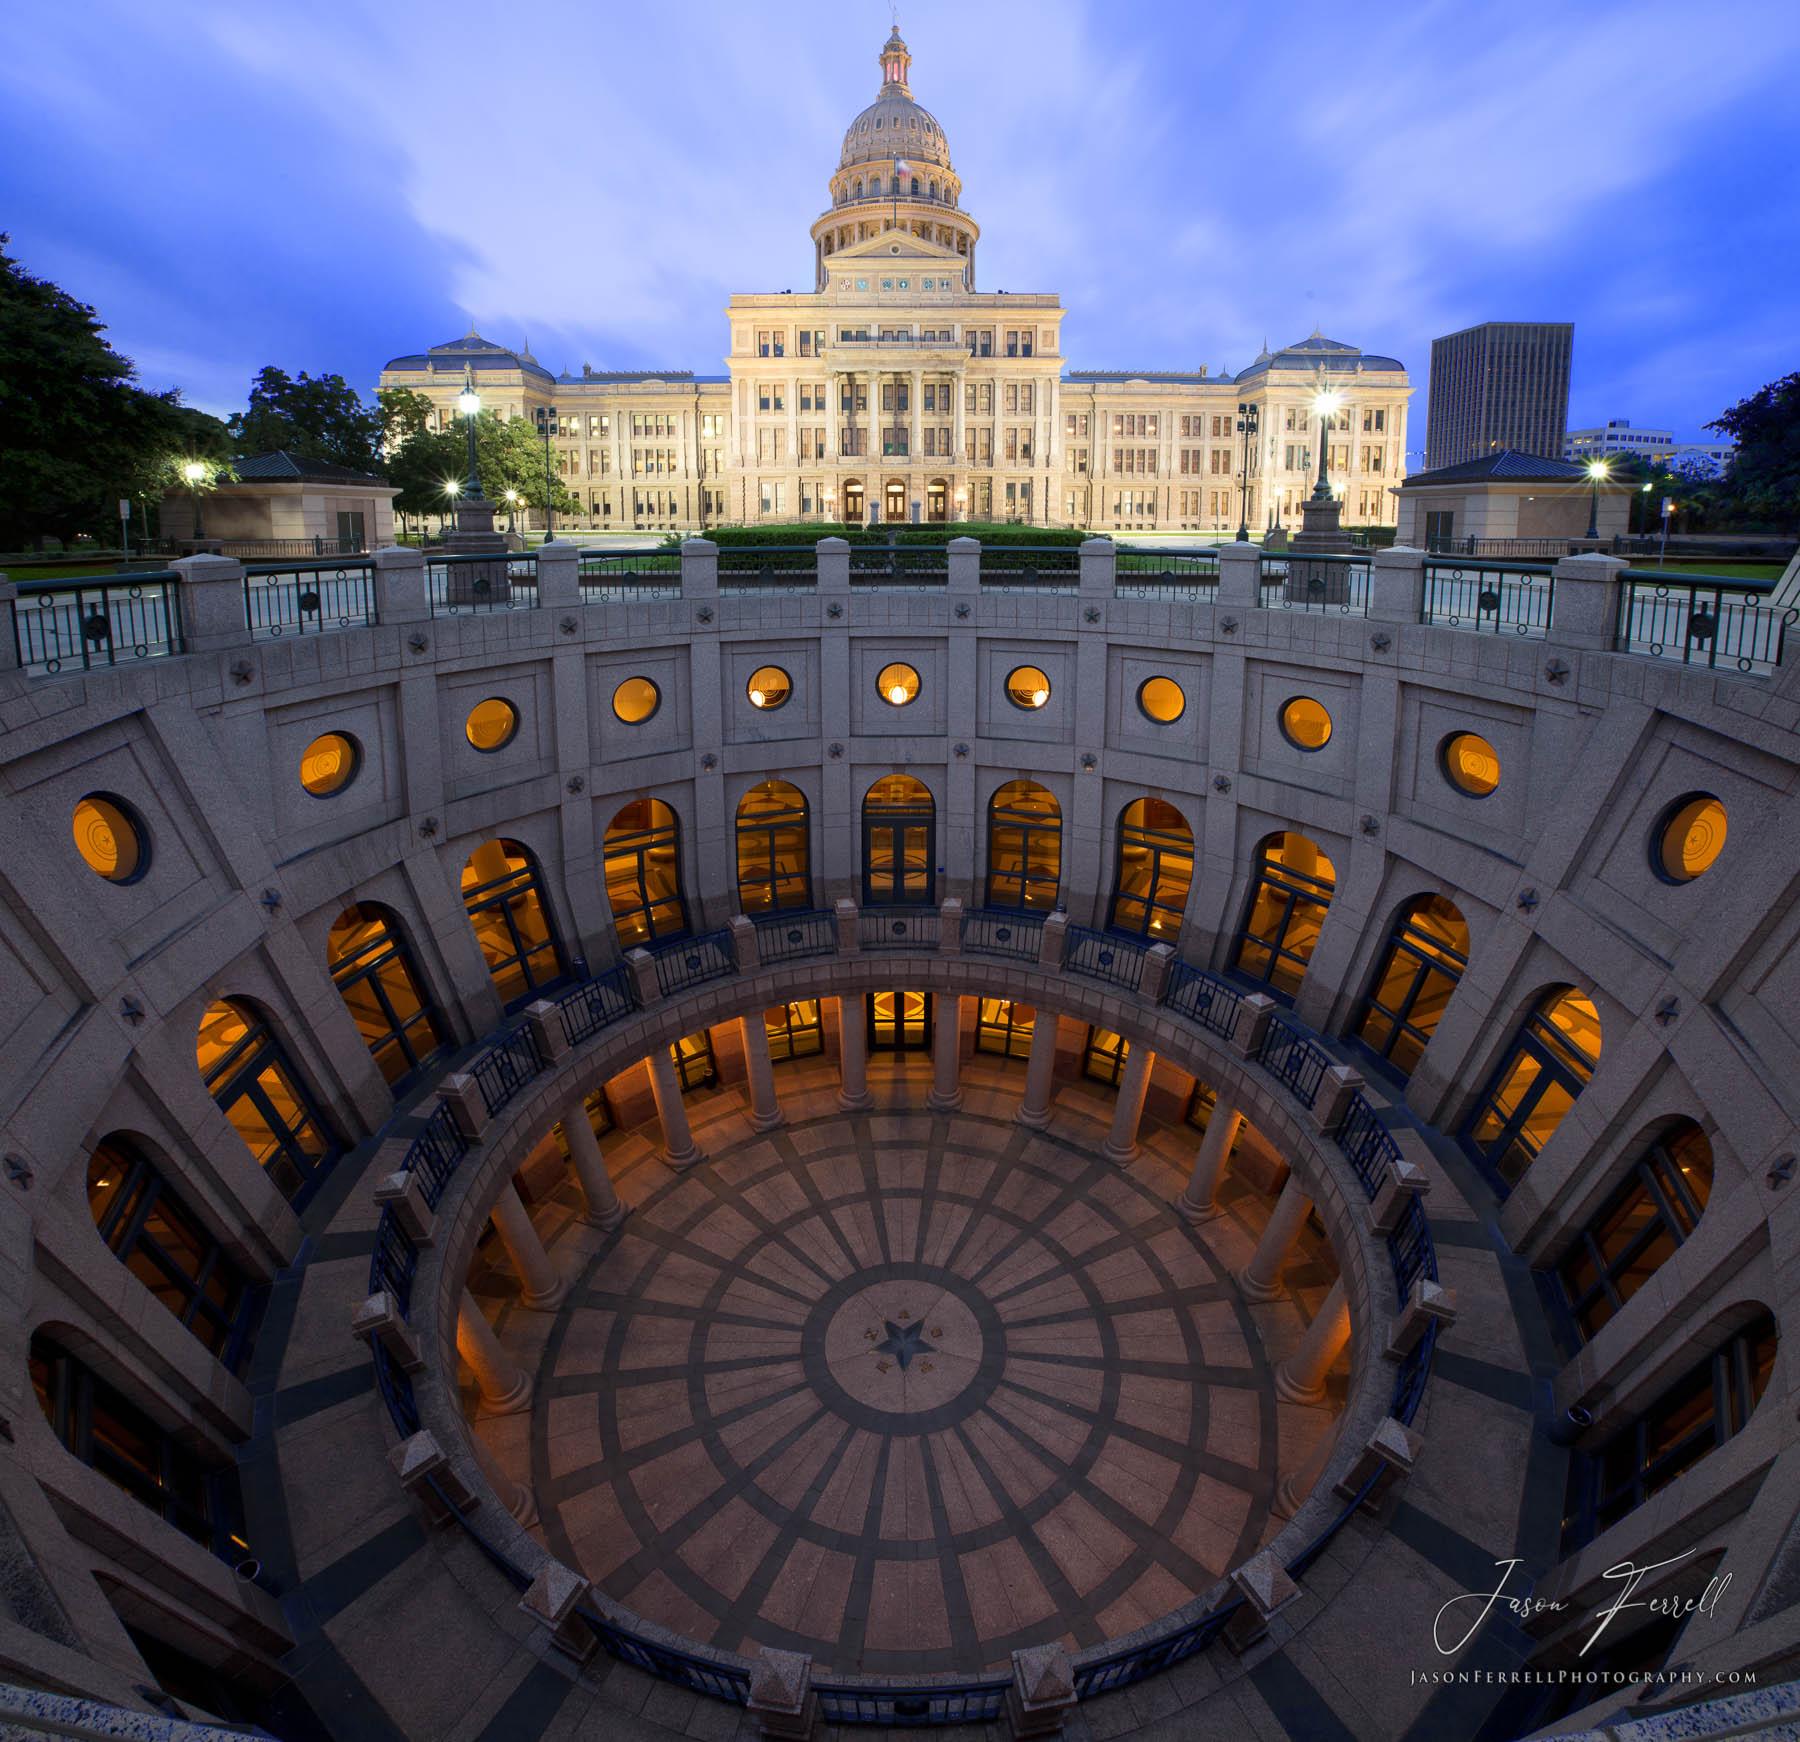 texas state capitol, building, downtown austin, govenor, legislature, dome, landscape, rotunda, historic, round, rome, pantheon, photo